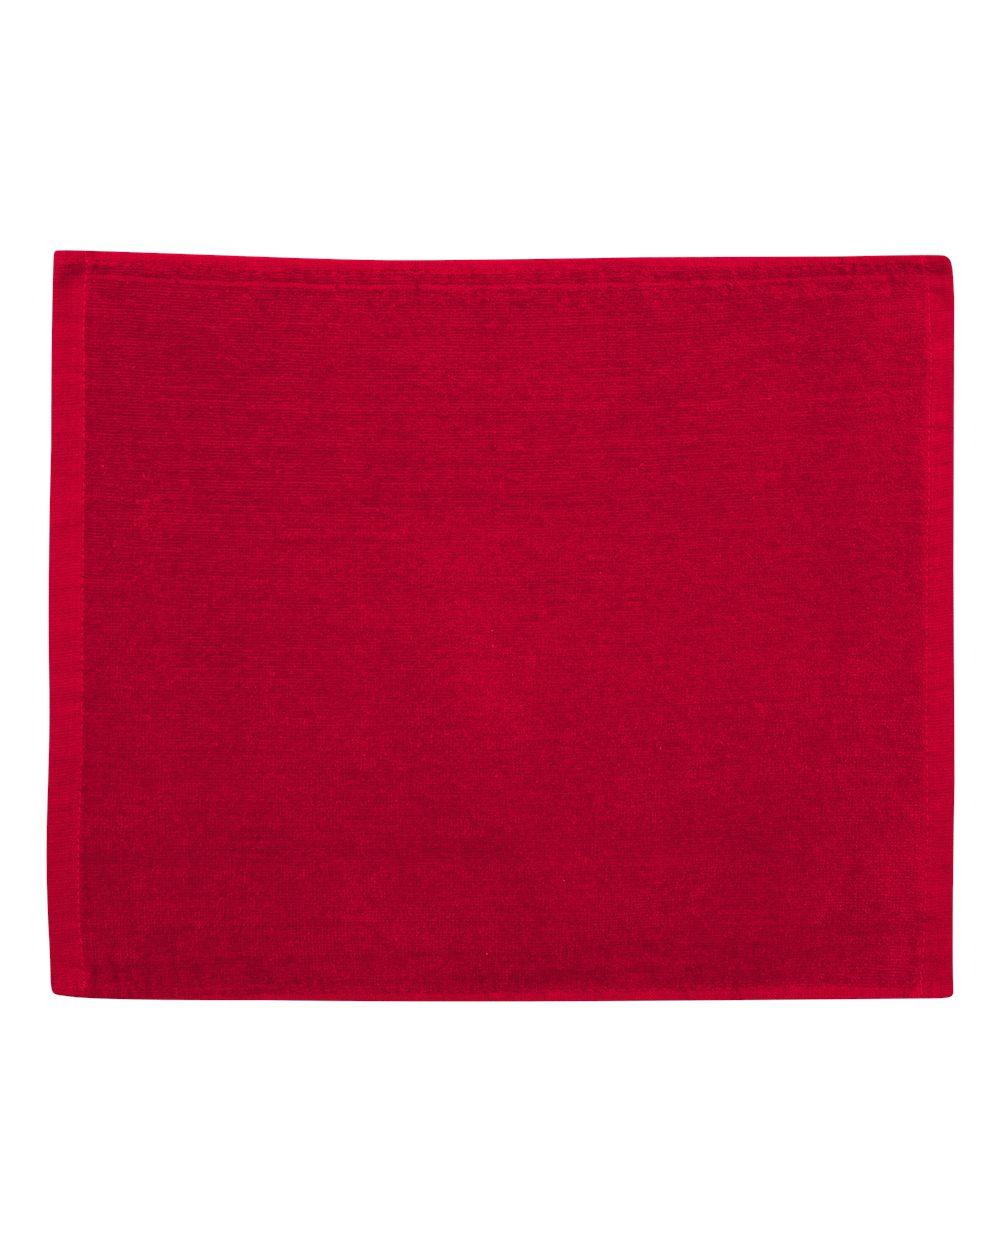 Carmel Towel Company 1518 - Velour Hemmed Towel